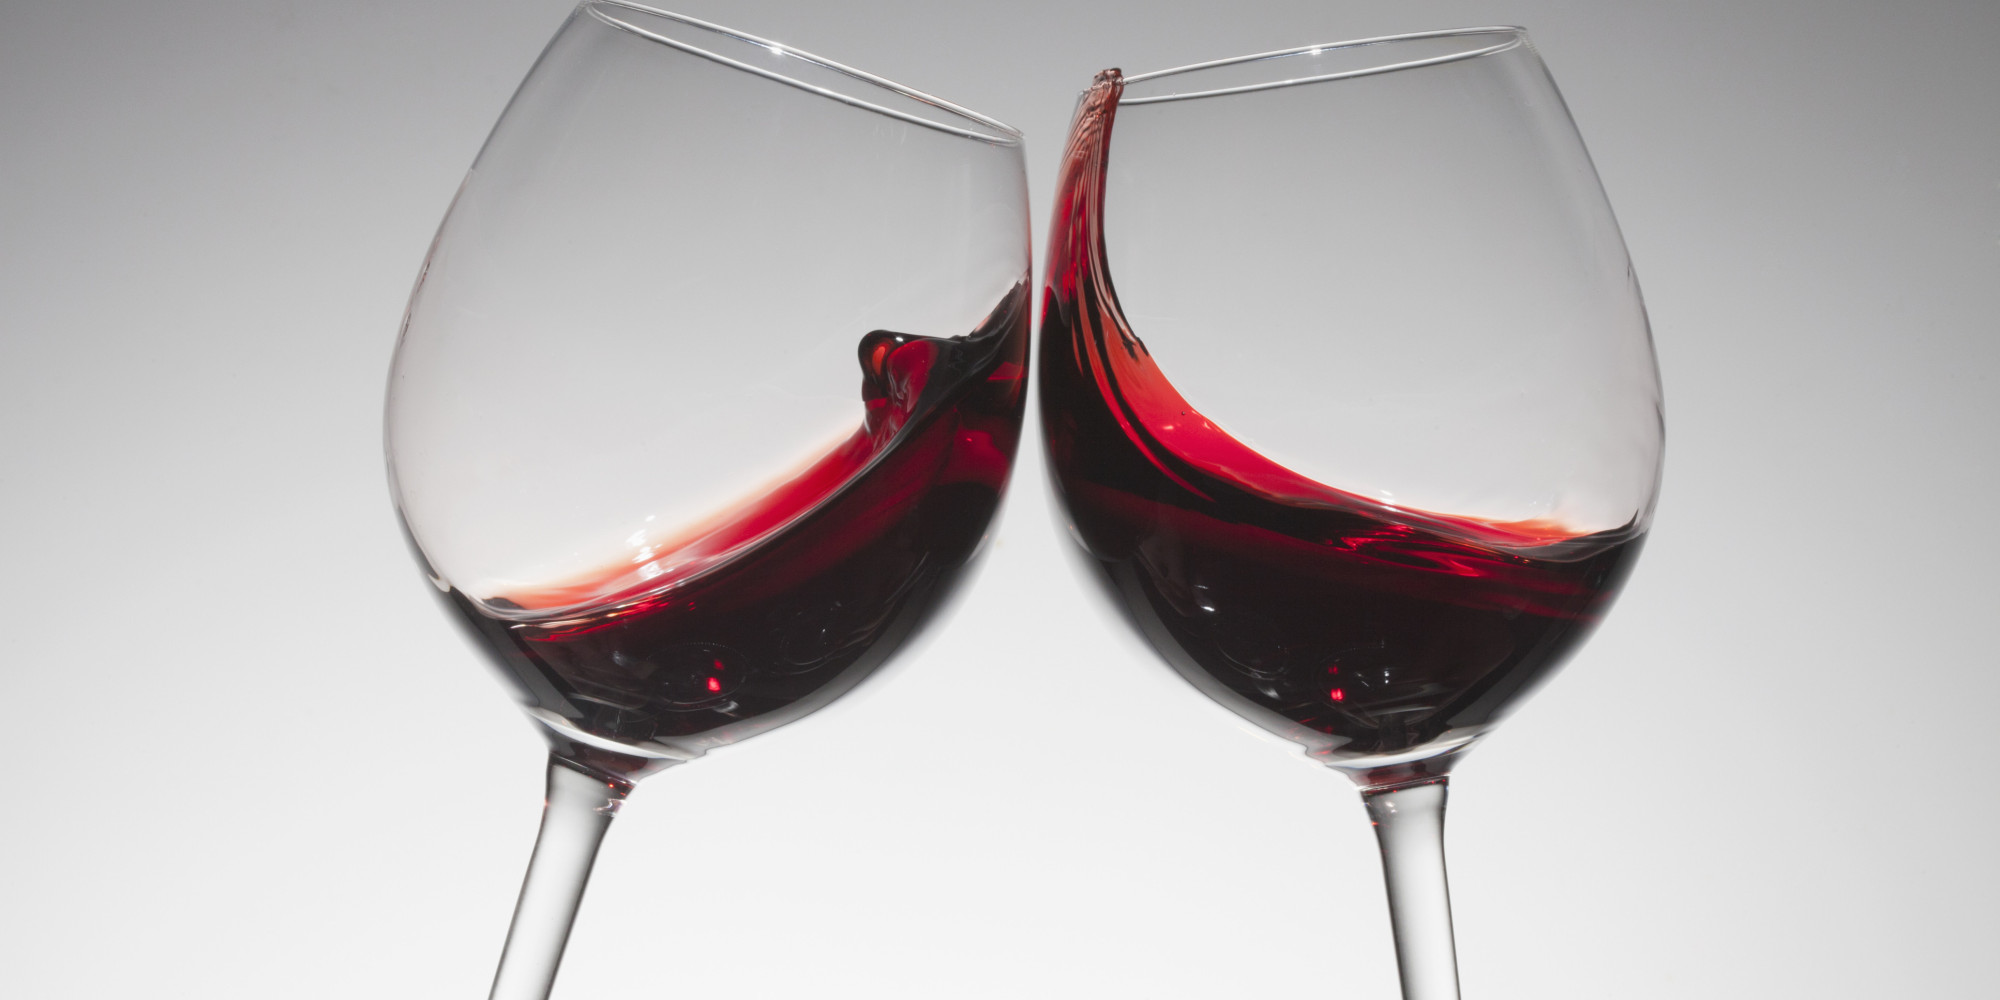 wine | Euro Palace Casino Blog